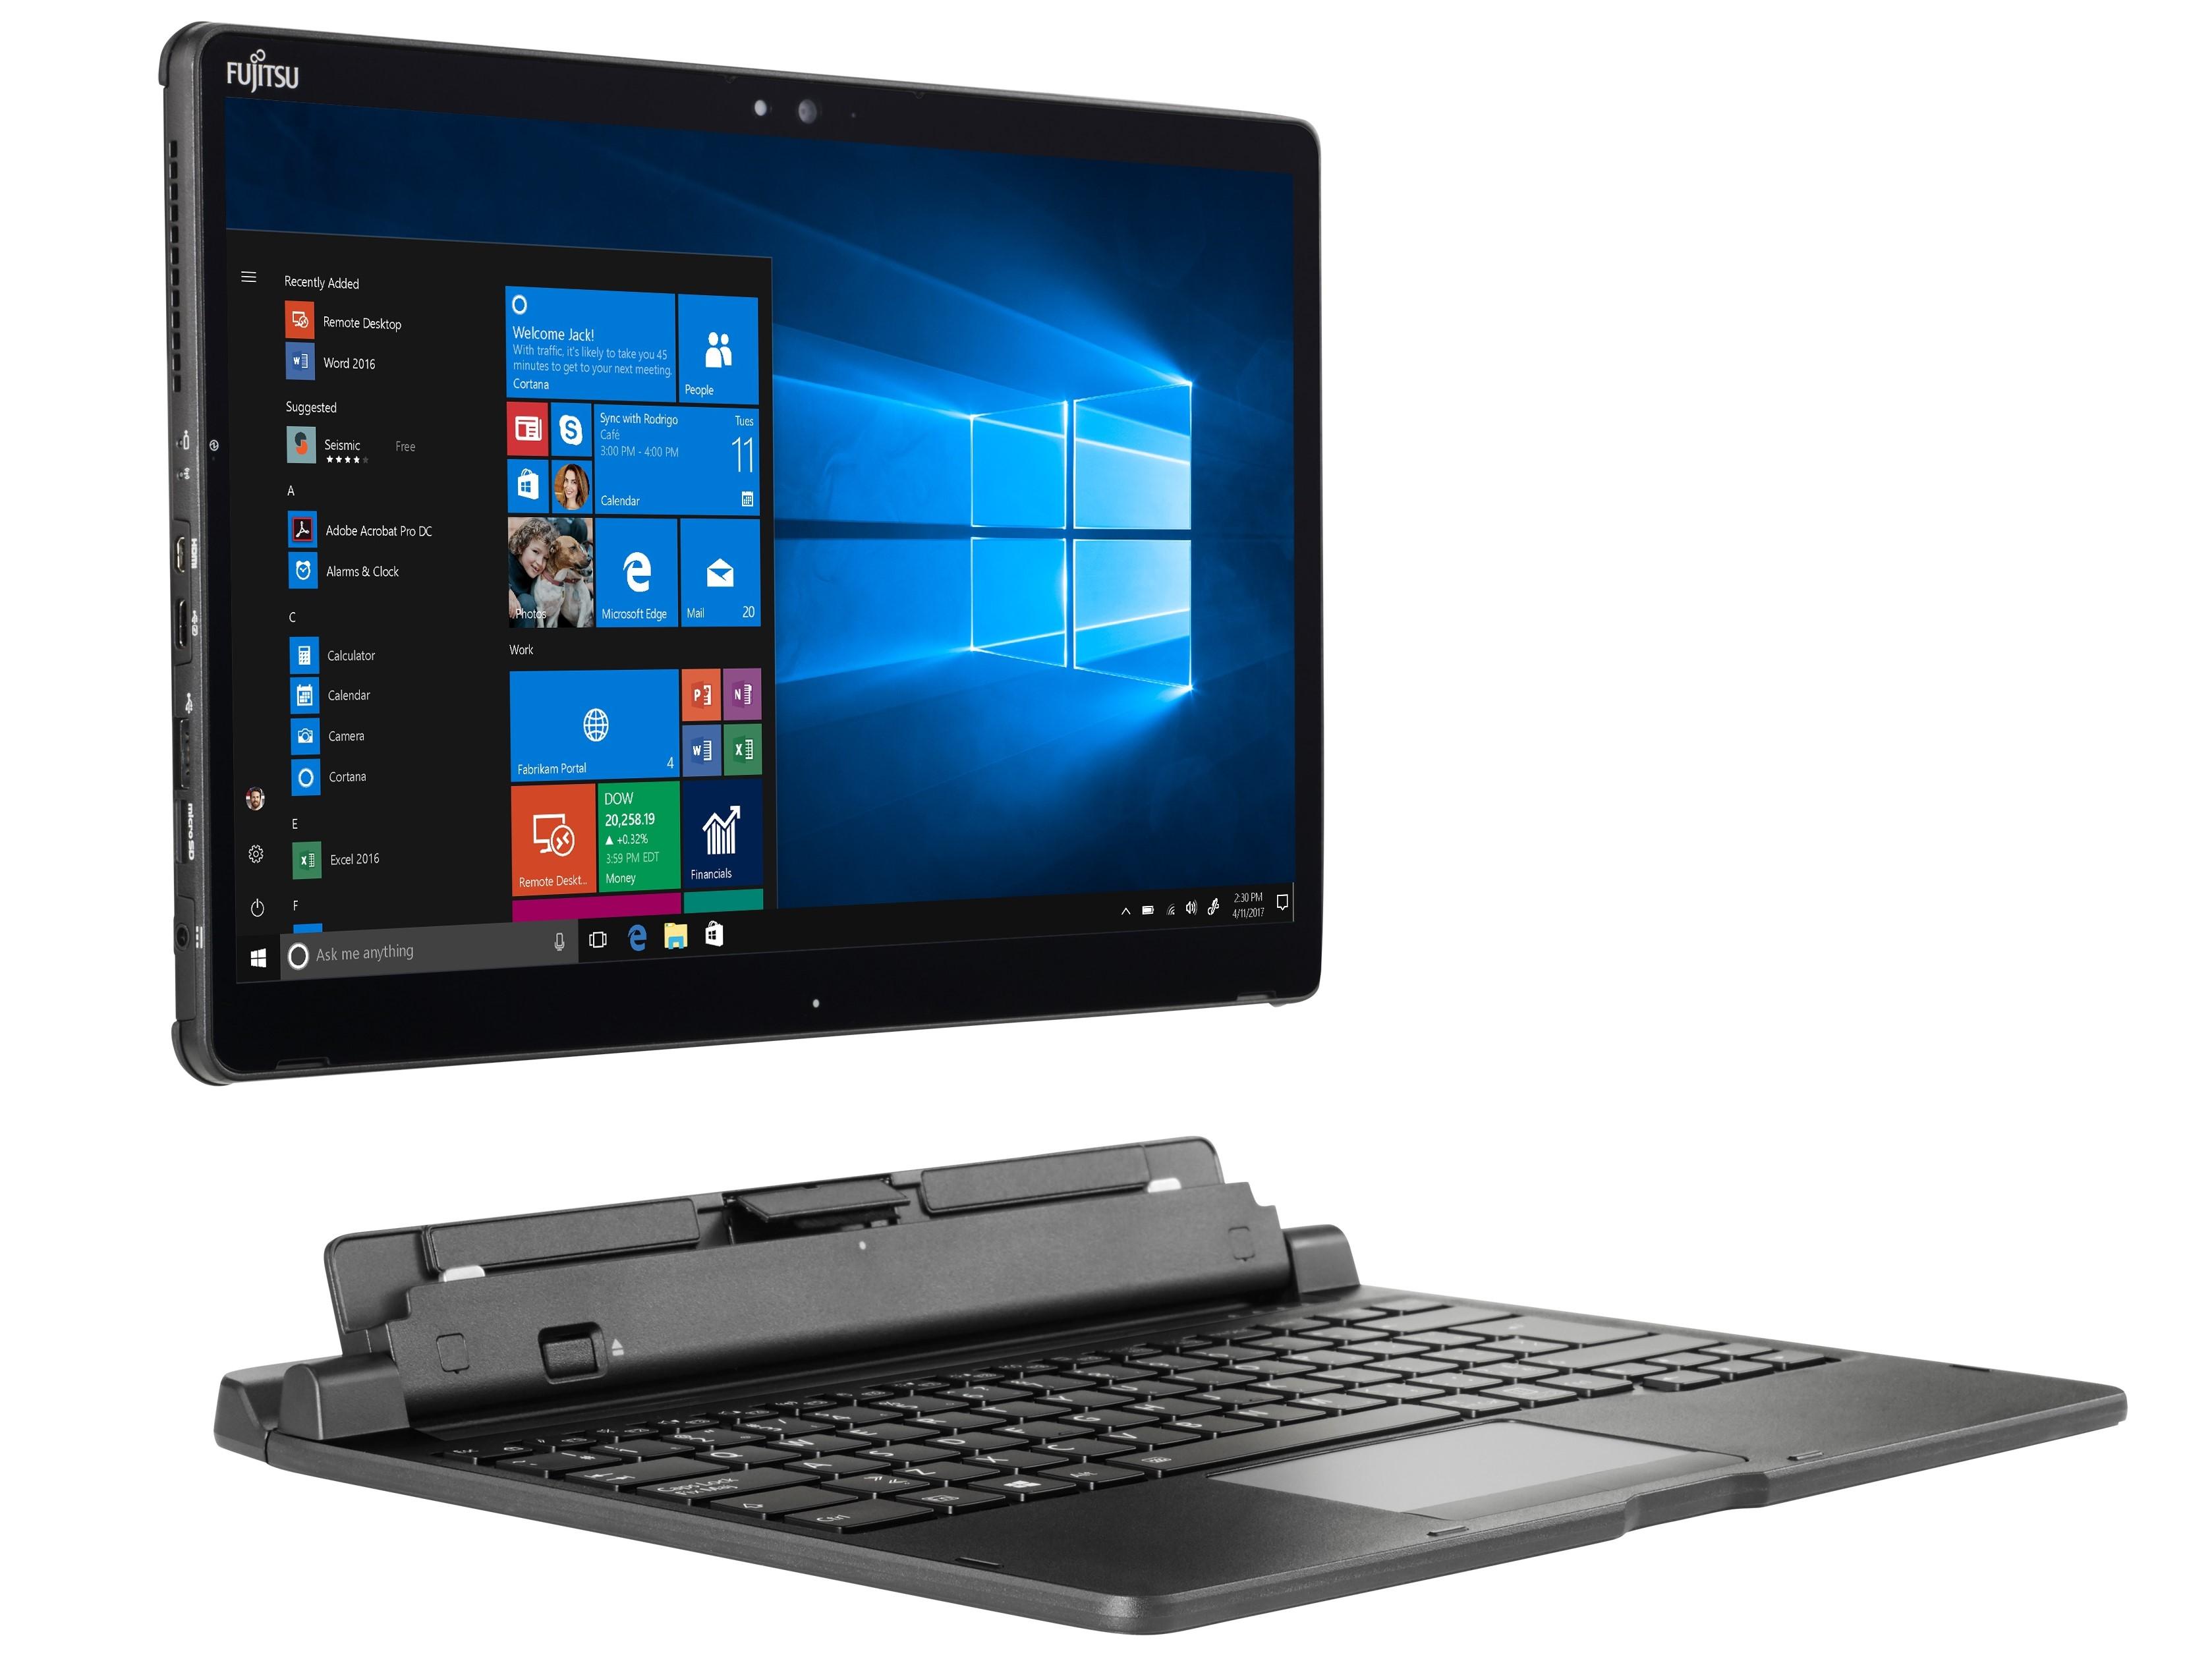 Smart Cover Reviews >> Fujitsu Stylistic Q738 (i5-8350U, UHD620) Convertible Review - NotebookCheck.net Reviews